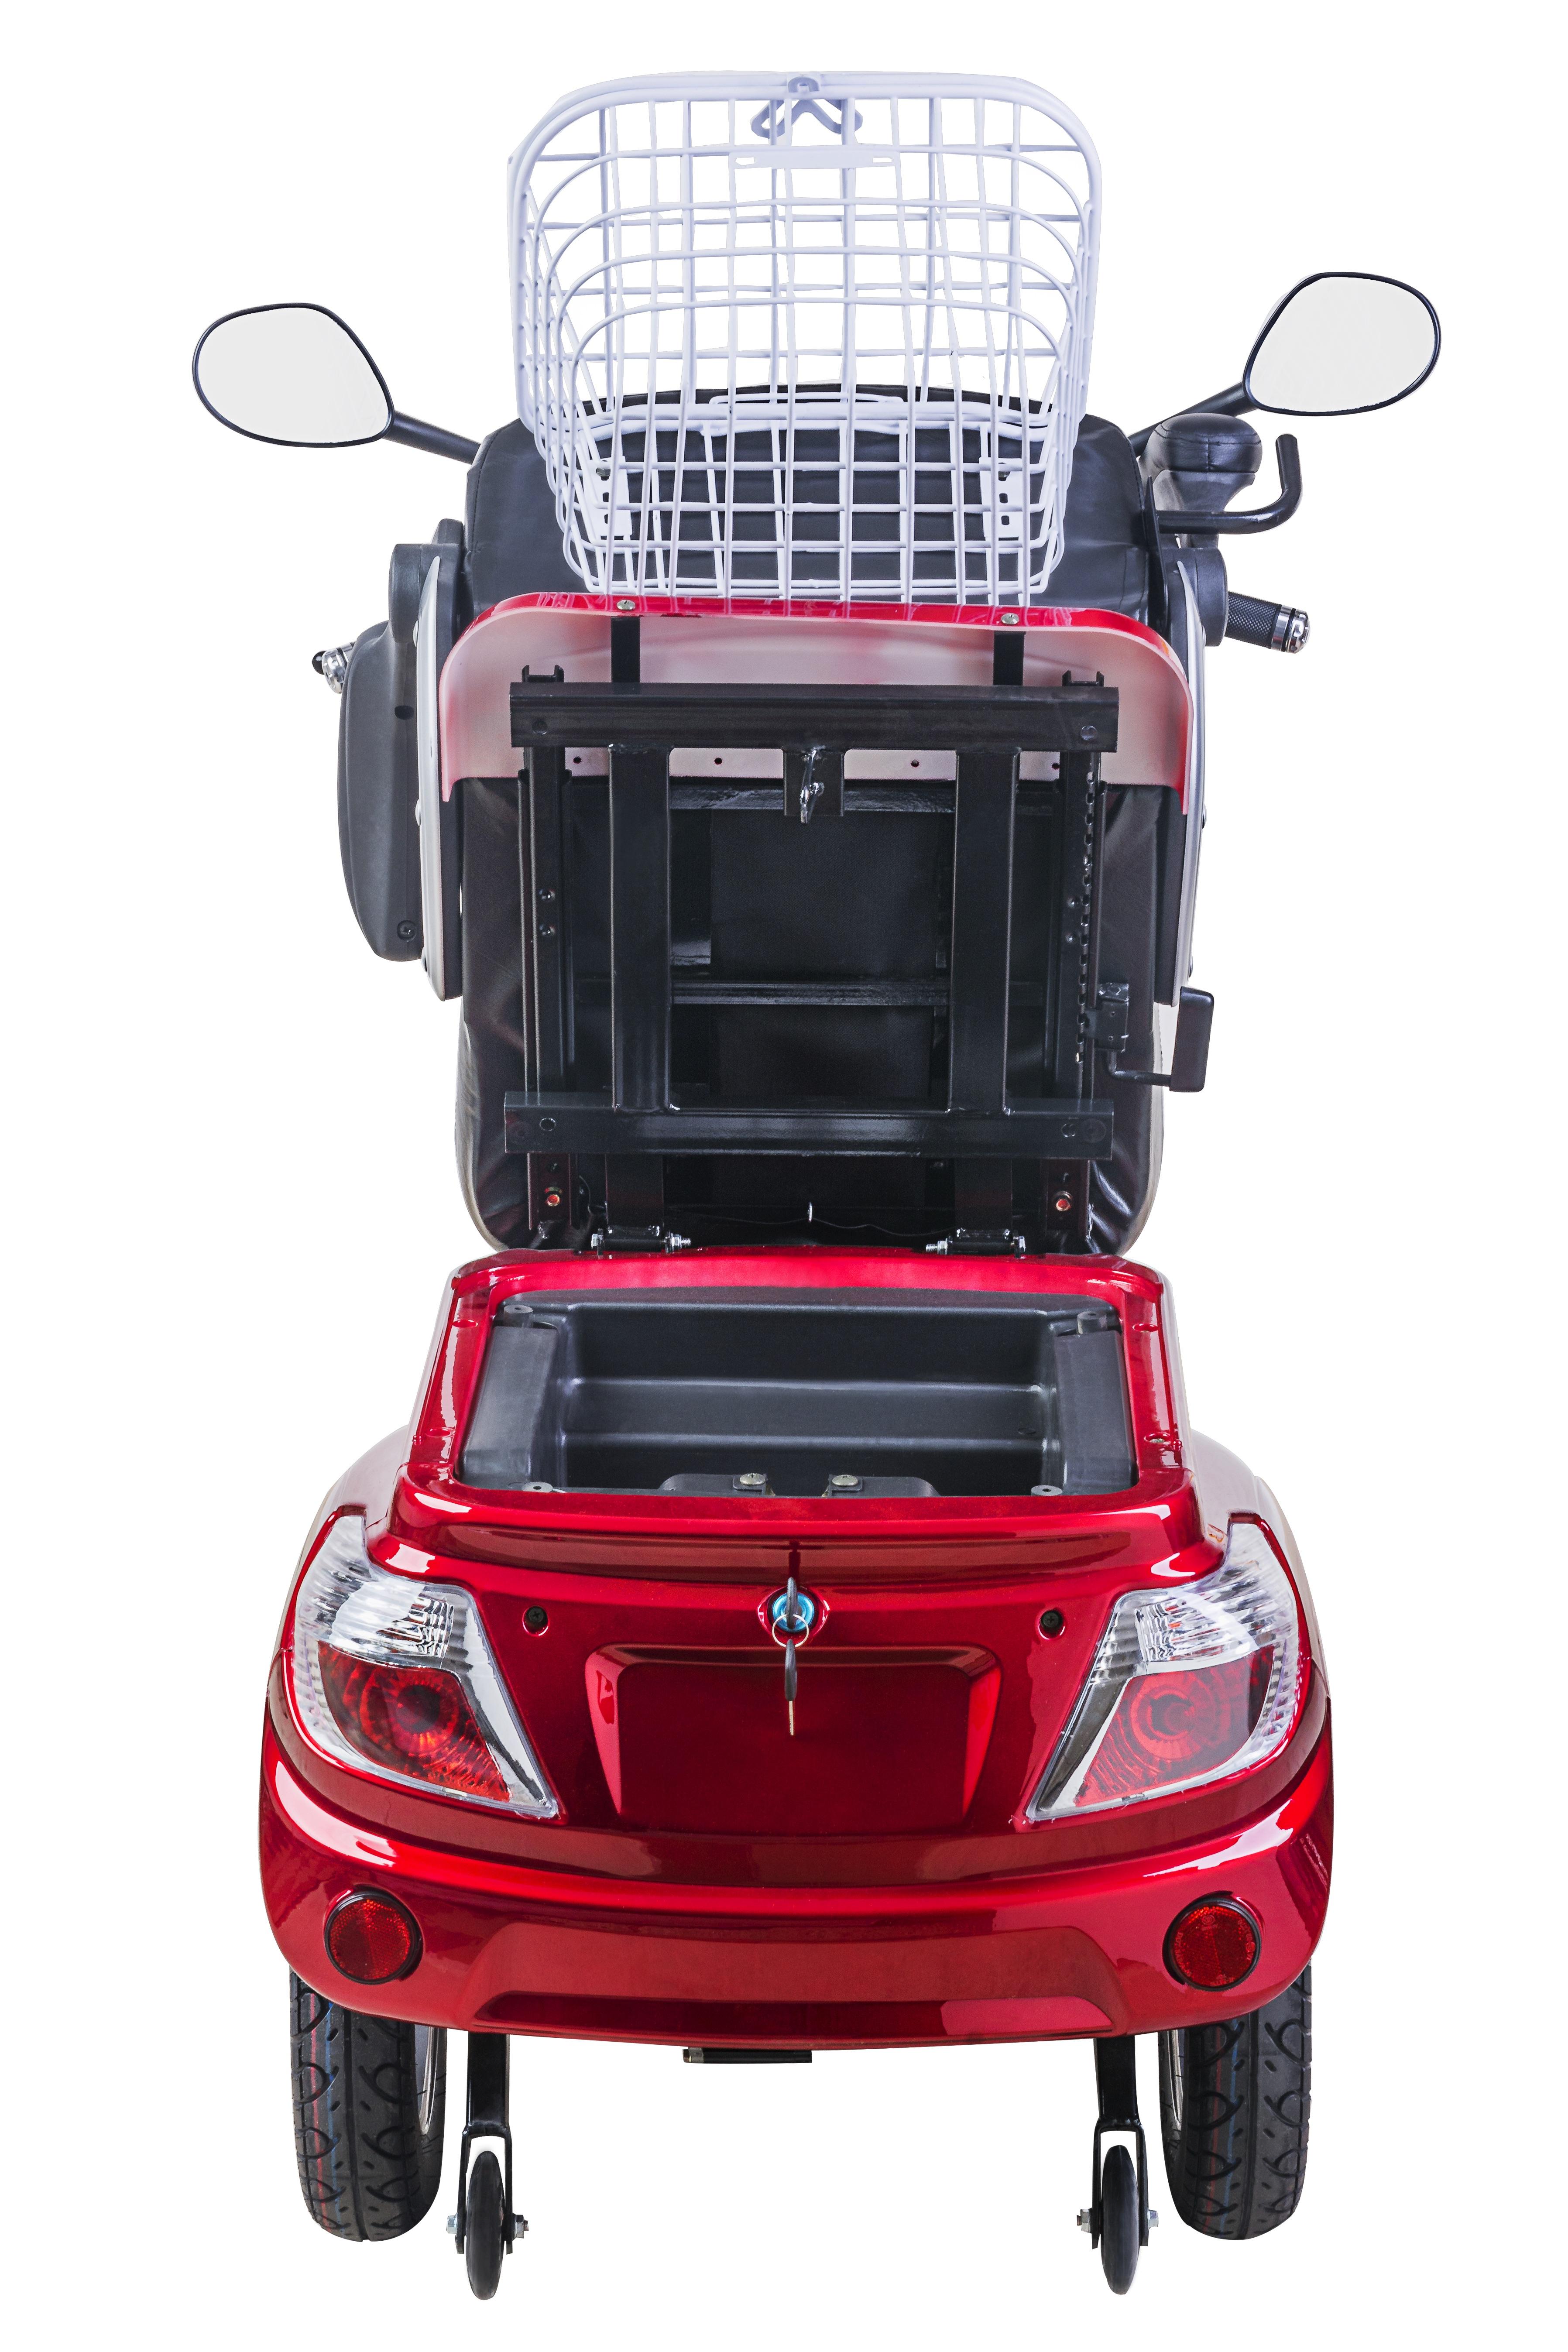 neu dreirad elektroroller elektromobil 25 km h led. Black Bedroom Furniture Sets. Home Design Ideas